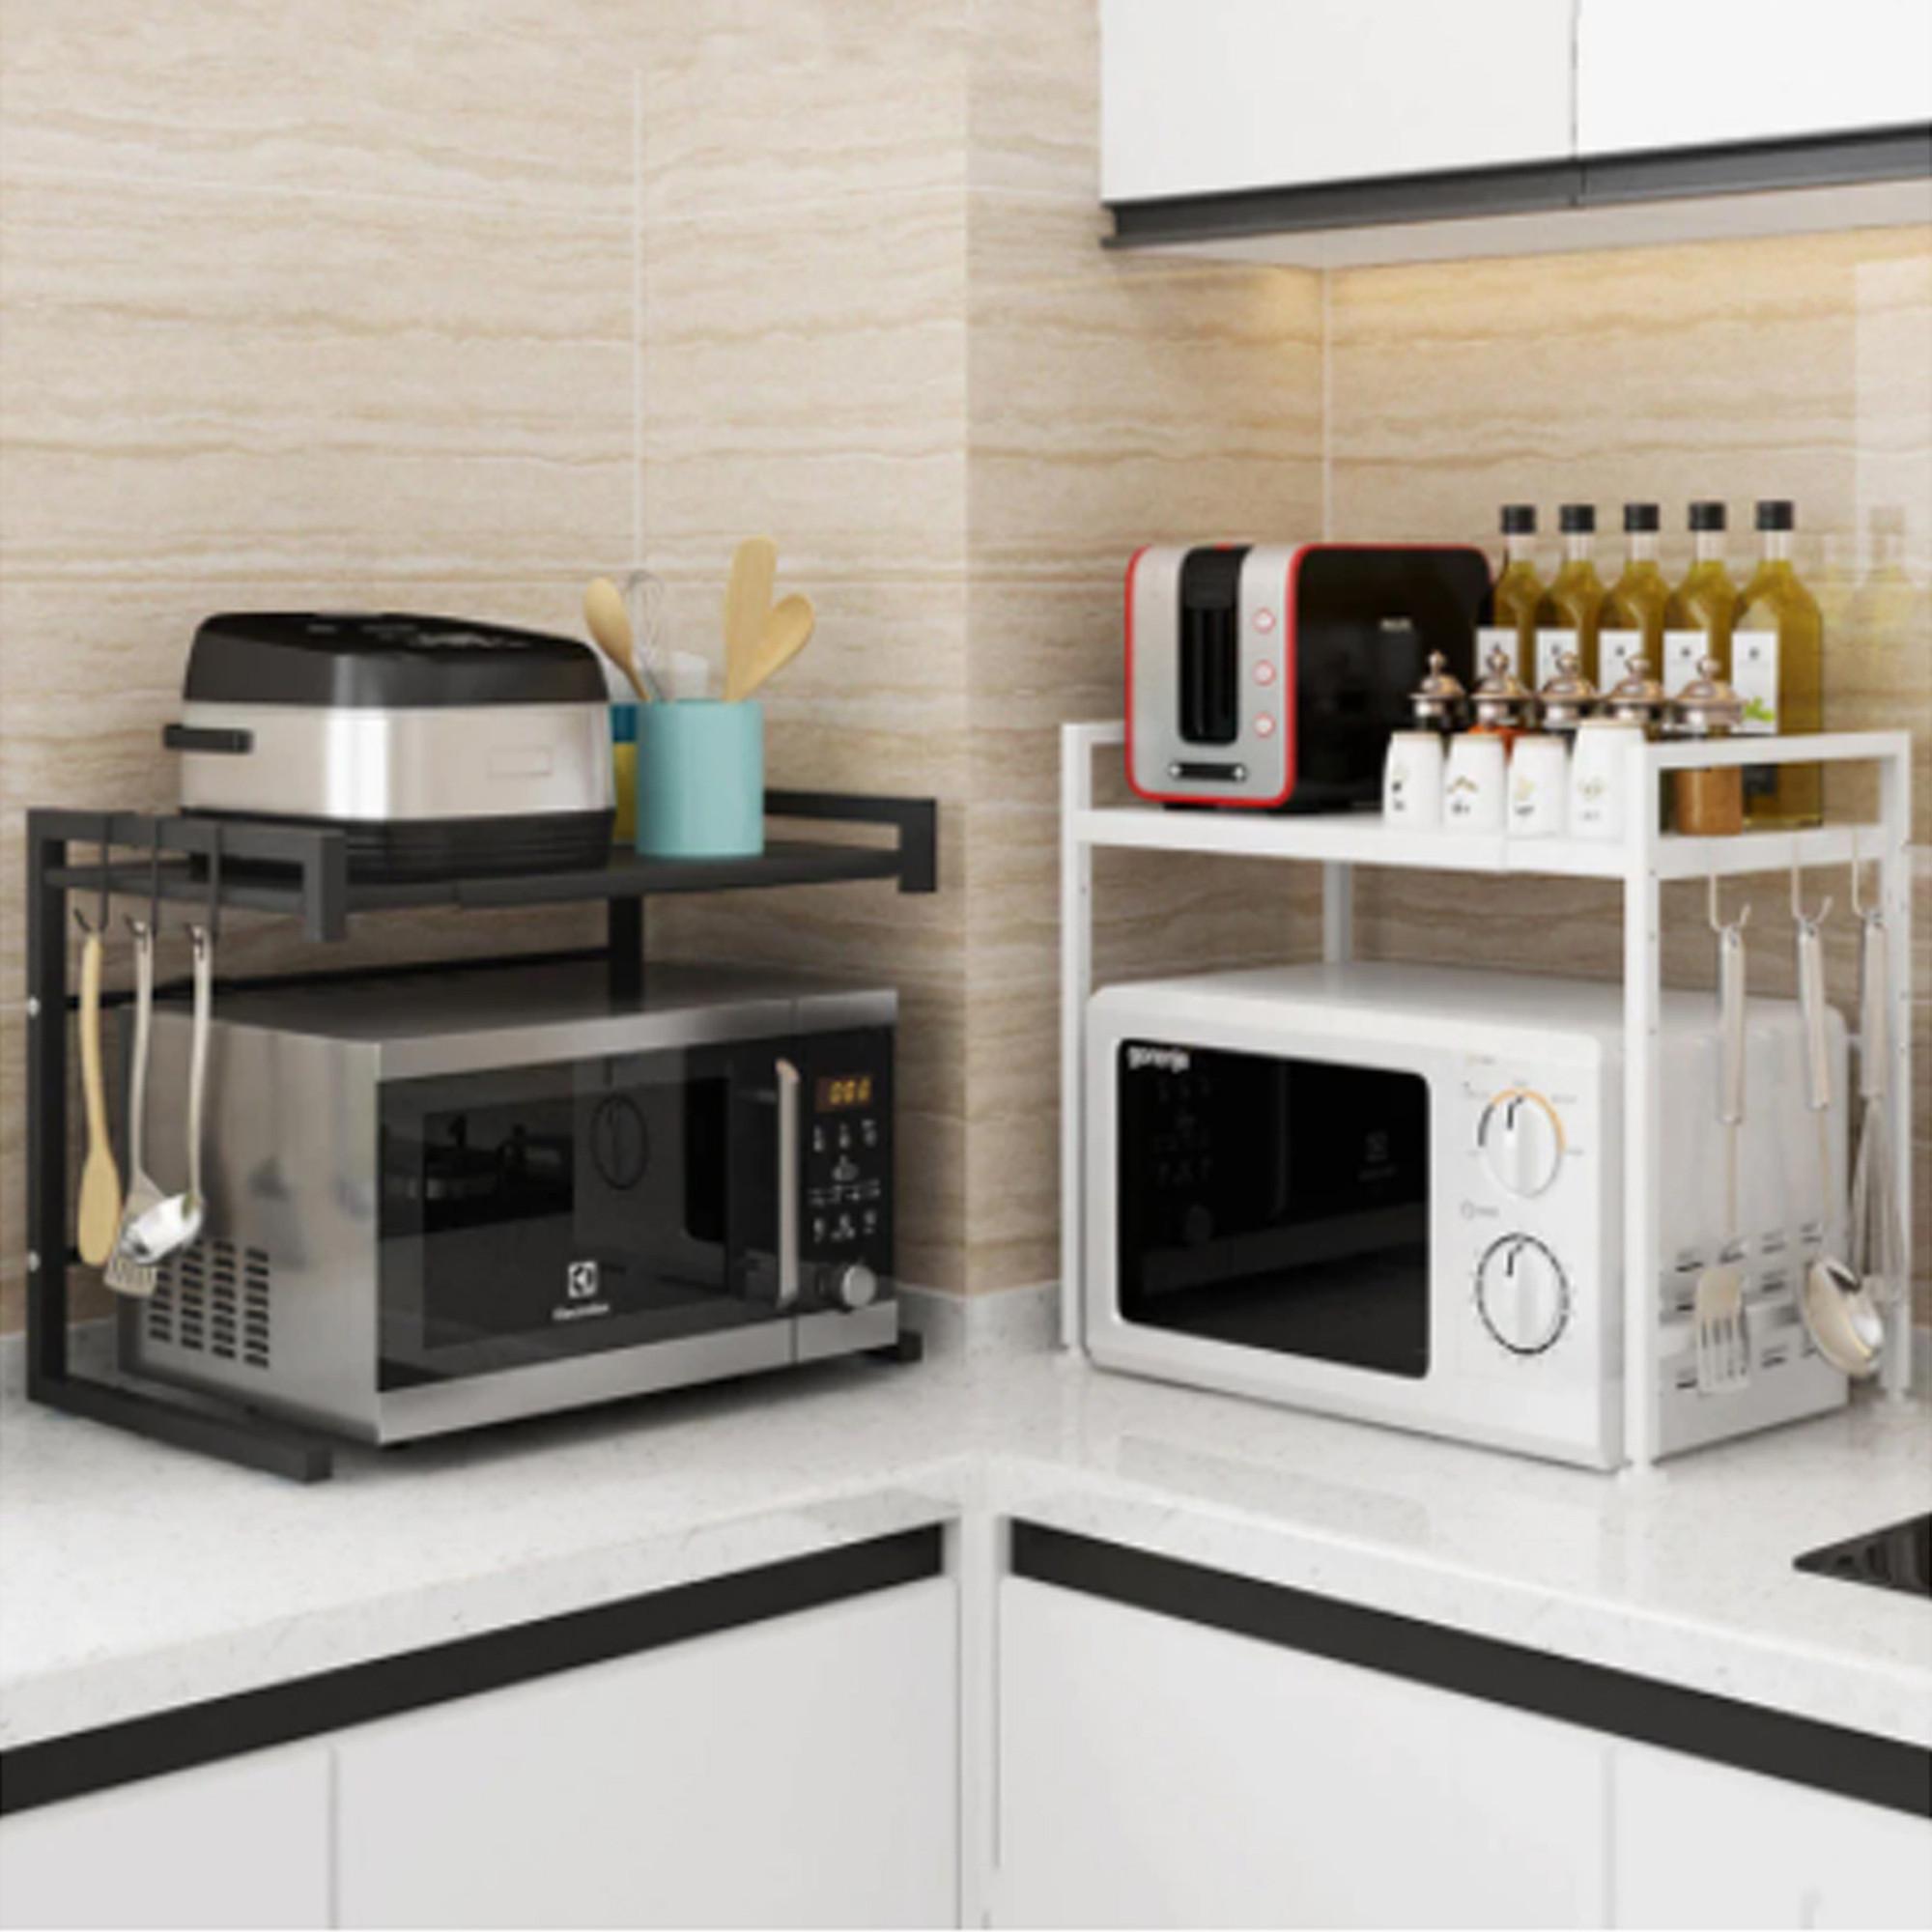 microwave oven rack retractable microwave oven rack shelf kitchen counter black